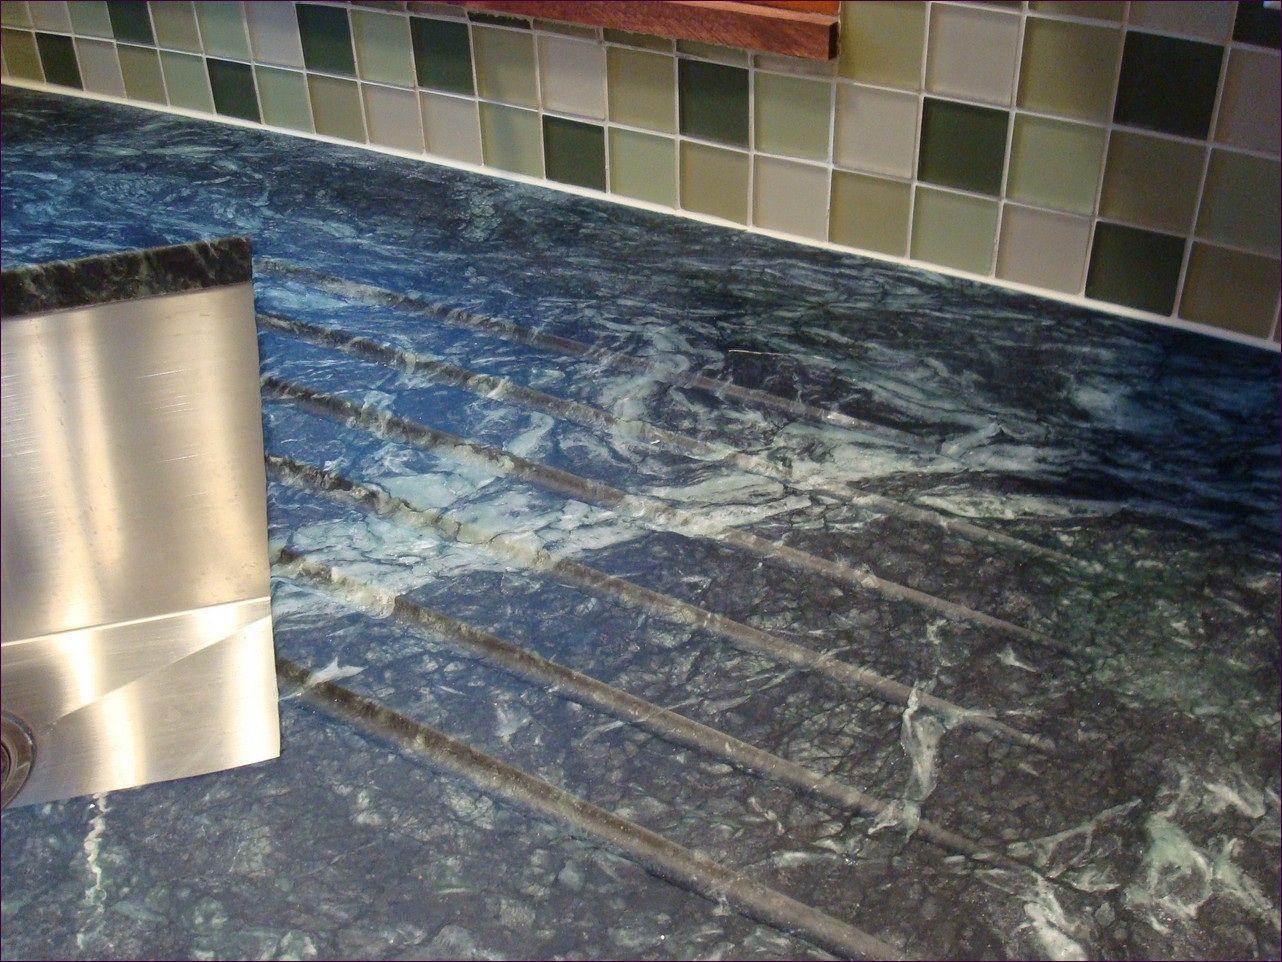 50+ Soapstone Countertops Cost Vs Granite   Kitchen Cabinets Update Ideas  On A Budget Check